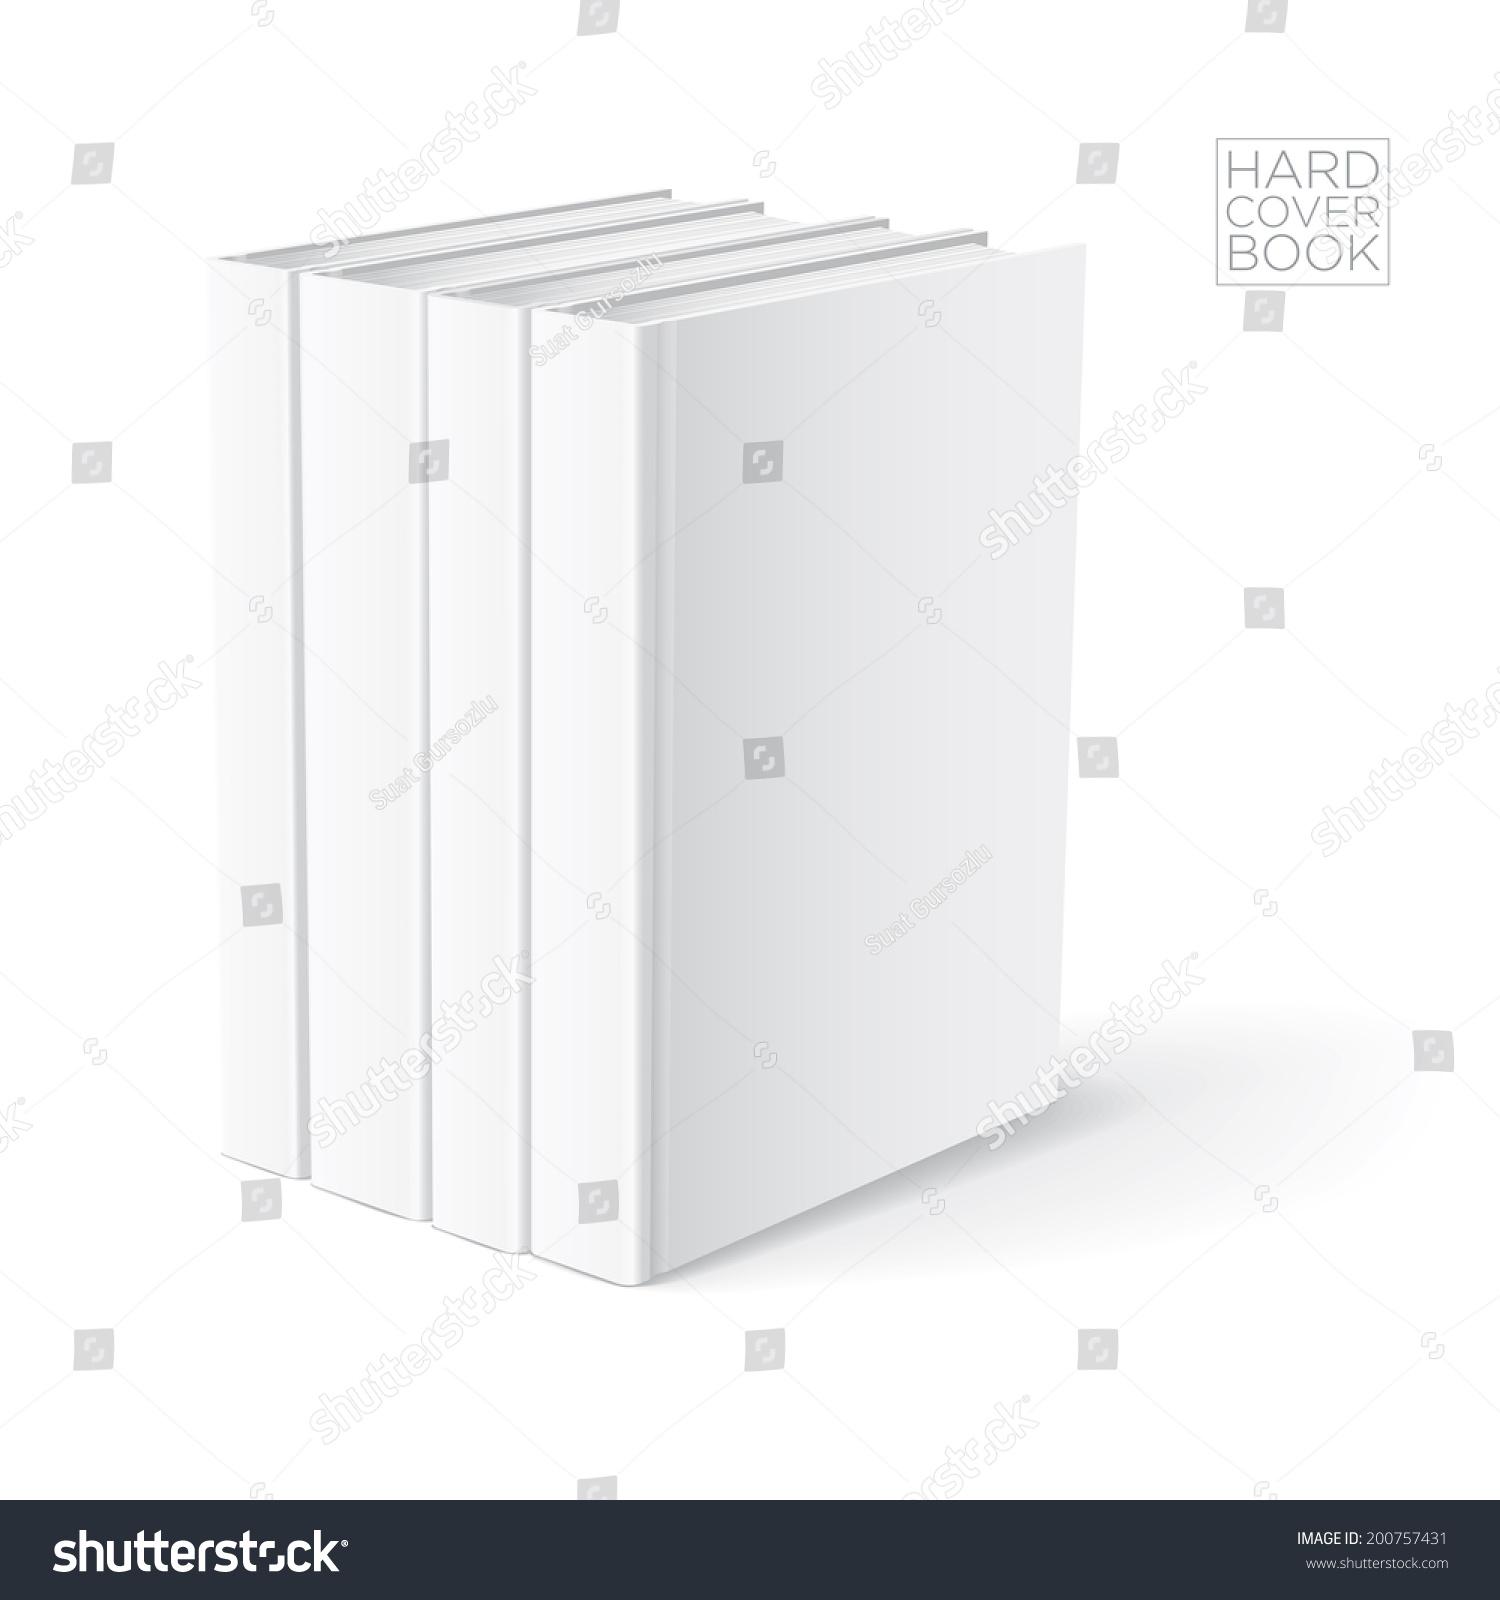 3d hard cover book design template vector detailed illustration